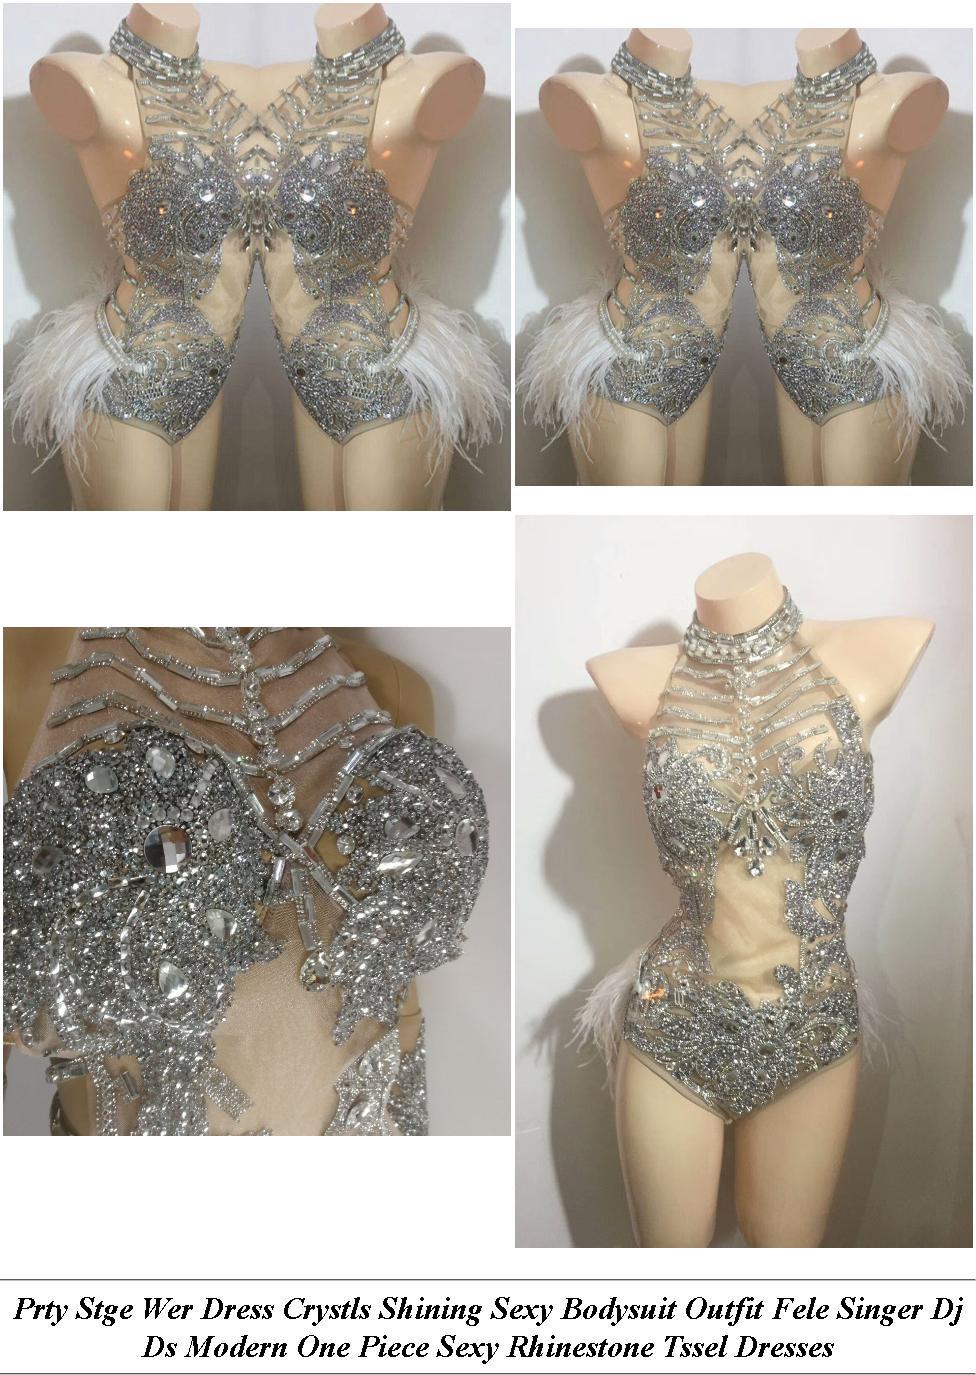 Maxi Dresses For Women - Online Sale Sites - Ross Dress For Less - Cheap Trendy Clothes